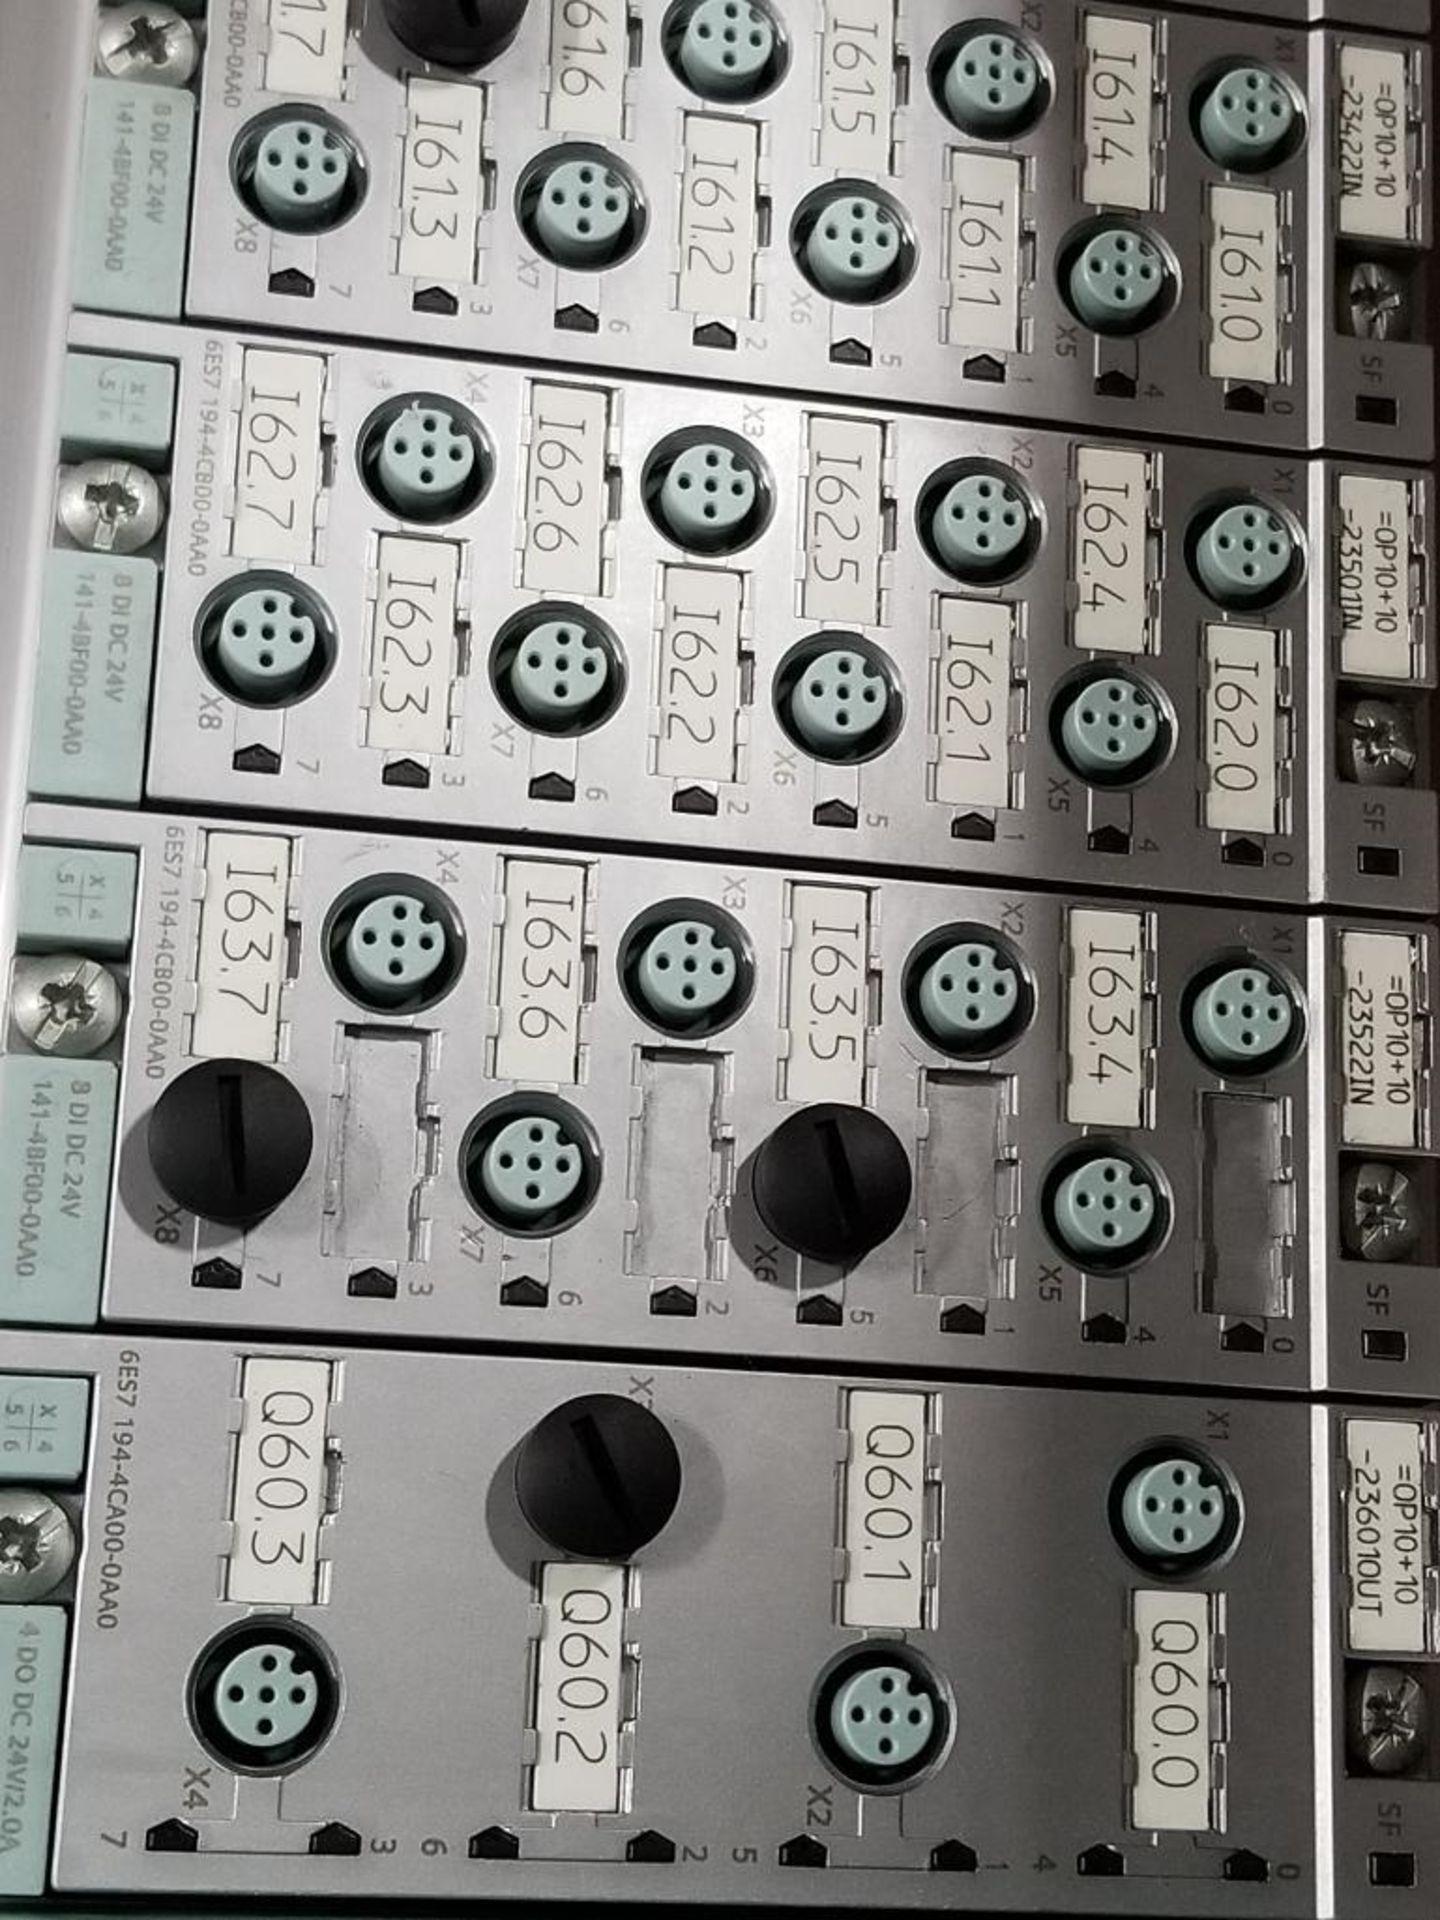 Siemens RSe-ST 3RK1304-5KS40-5AA3 Reversing starter and flow control line. - Image 5 of 6